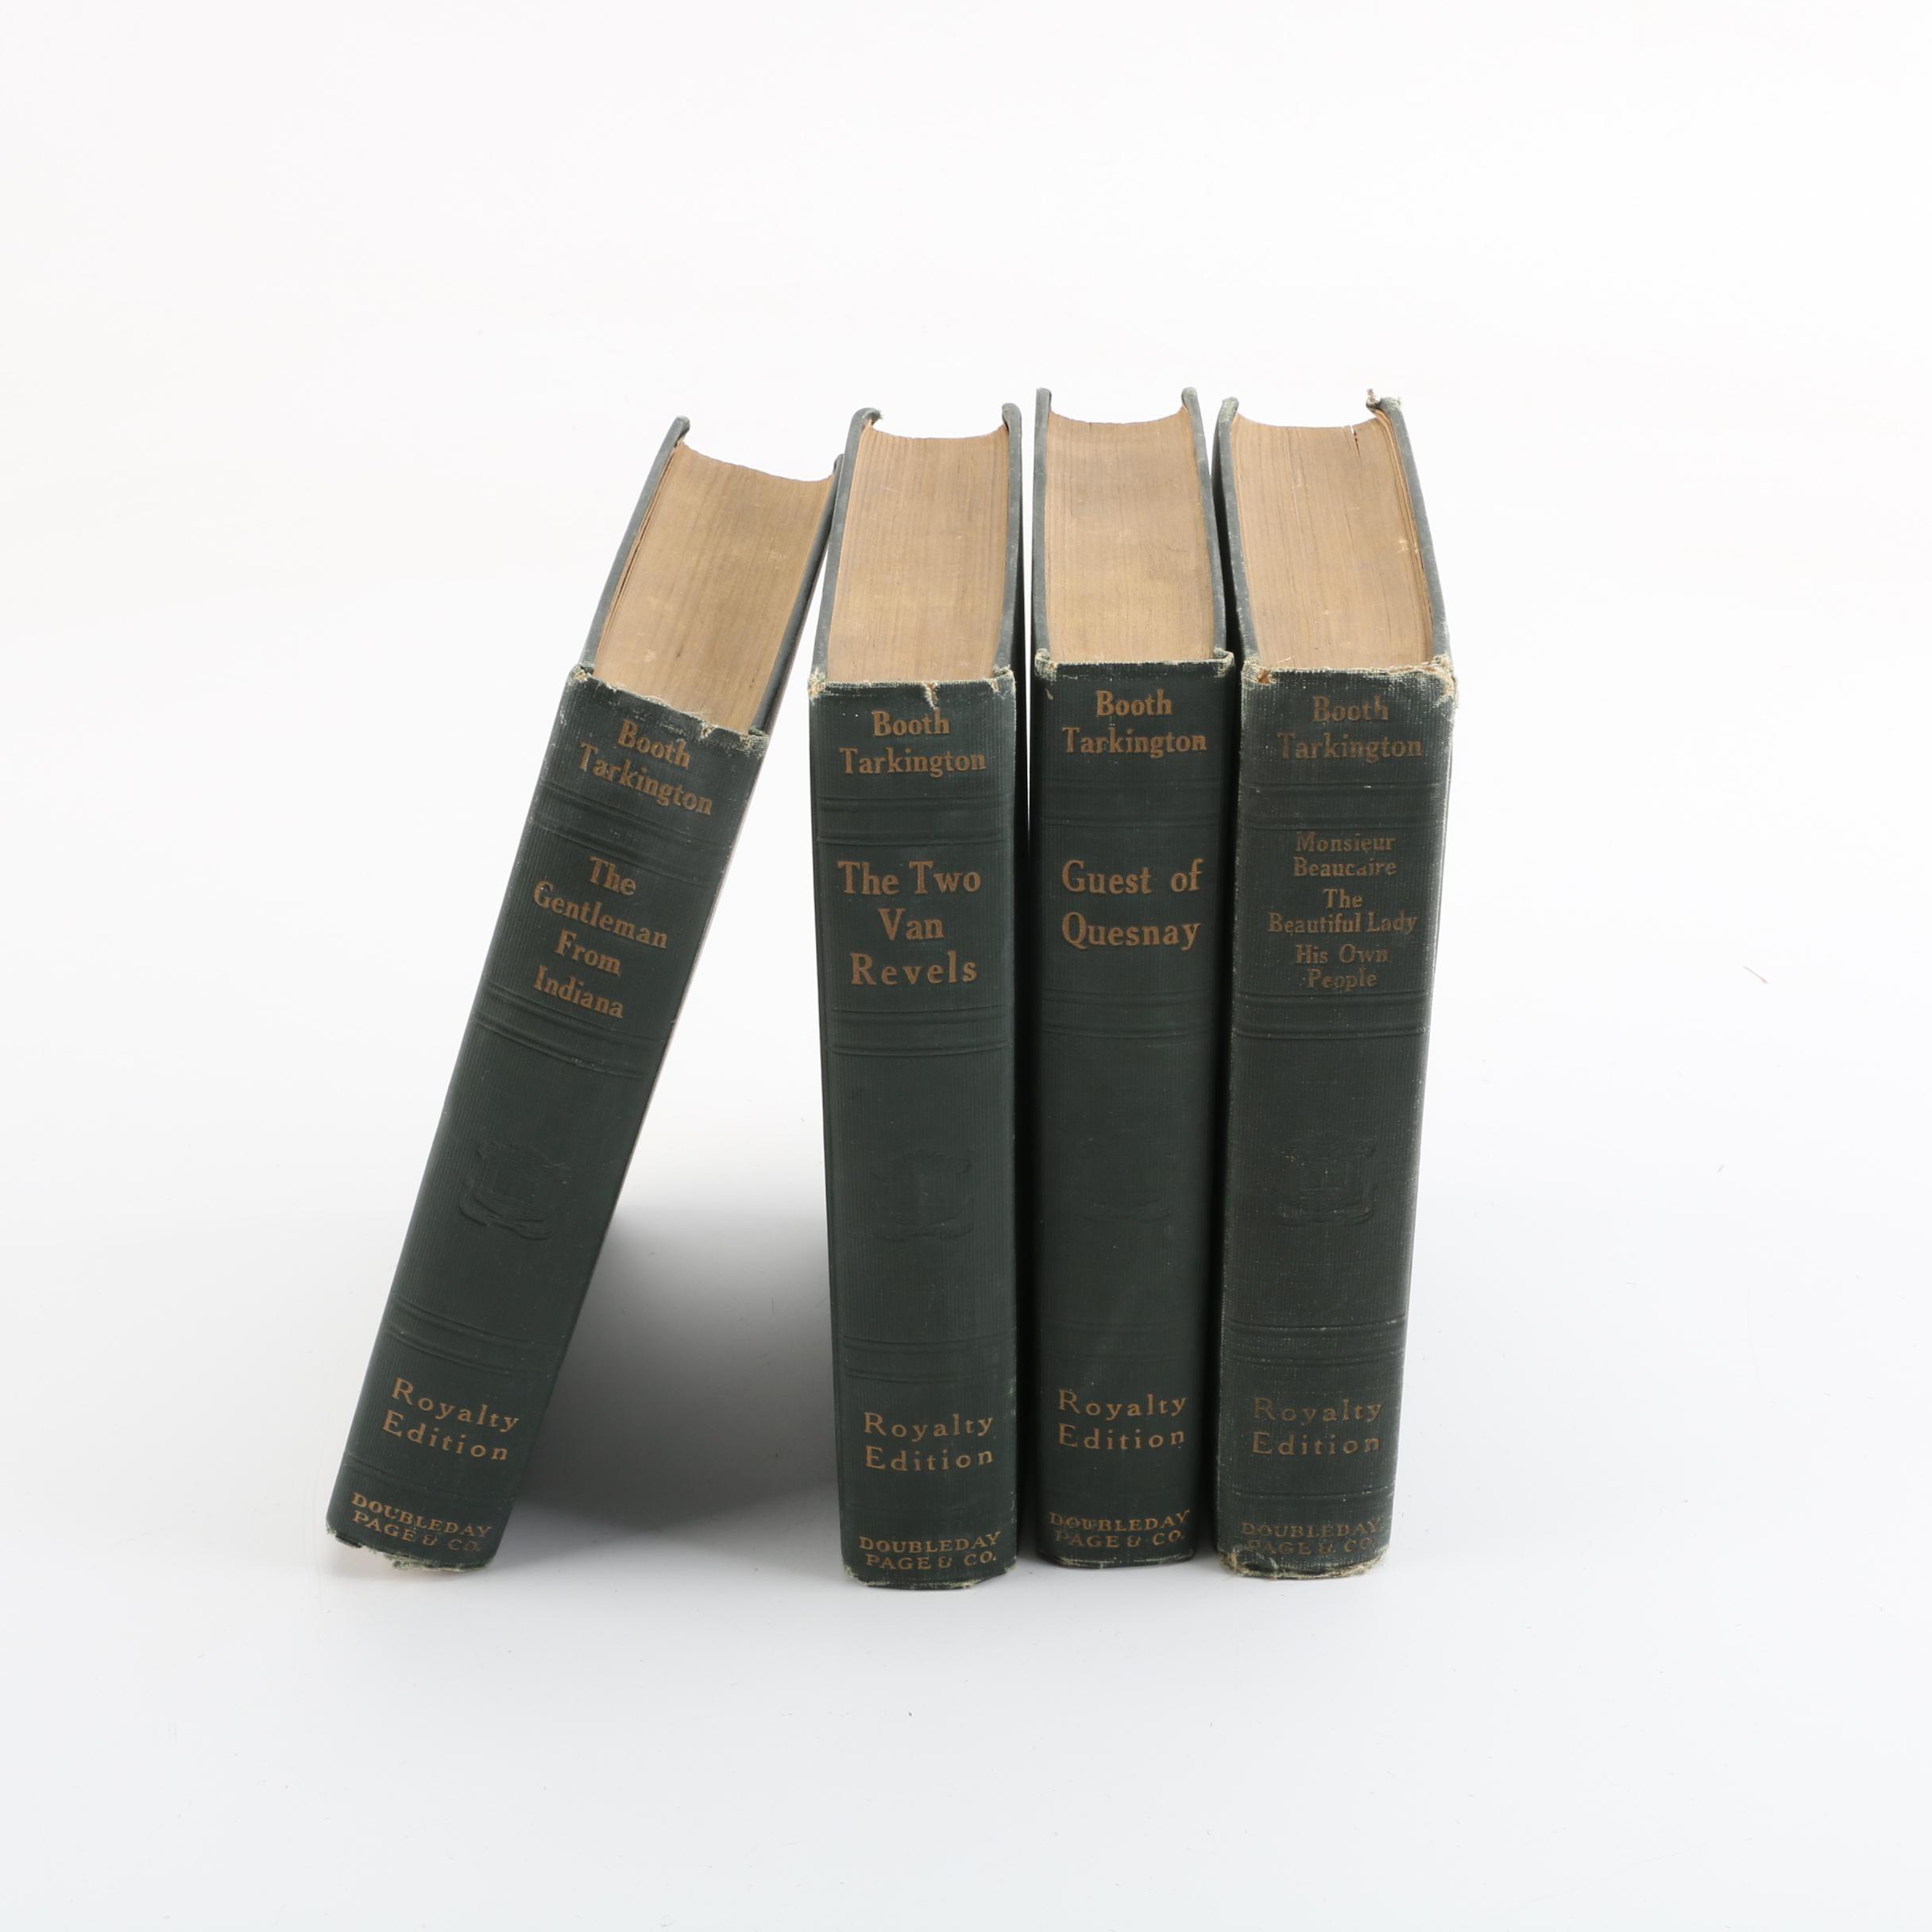 Antique Books by Booth Tarkington